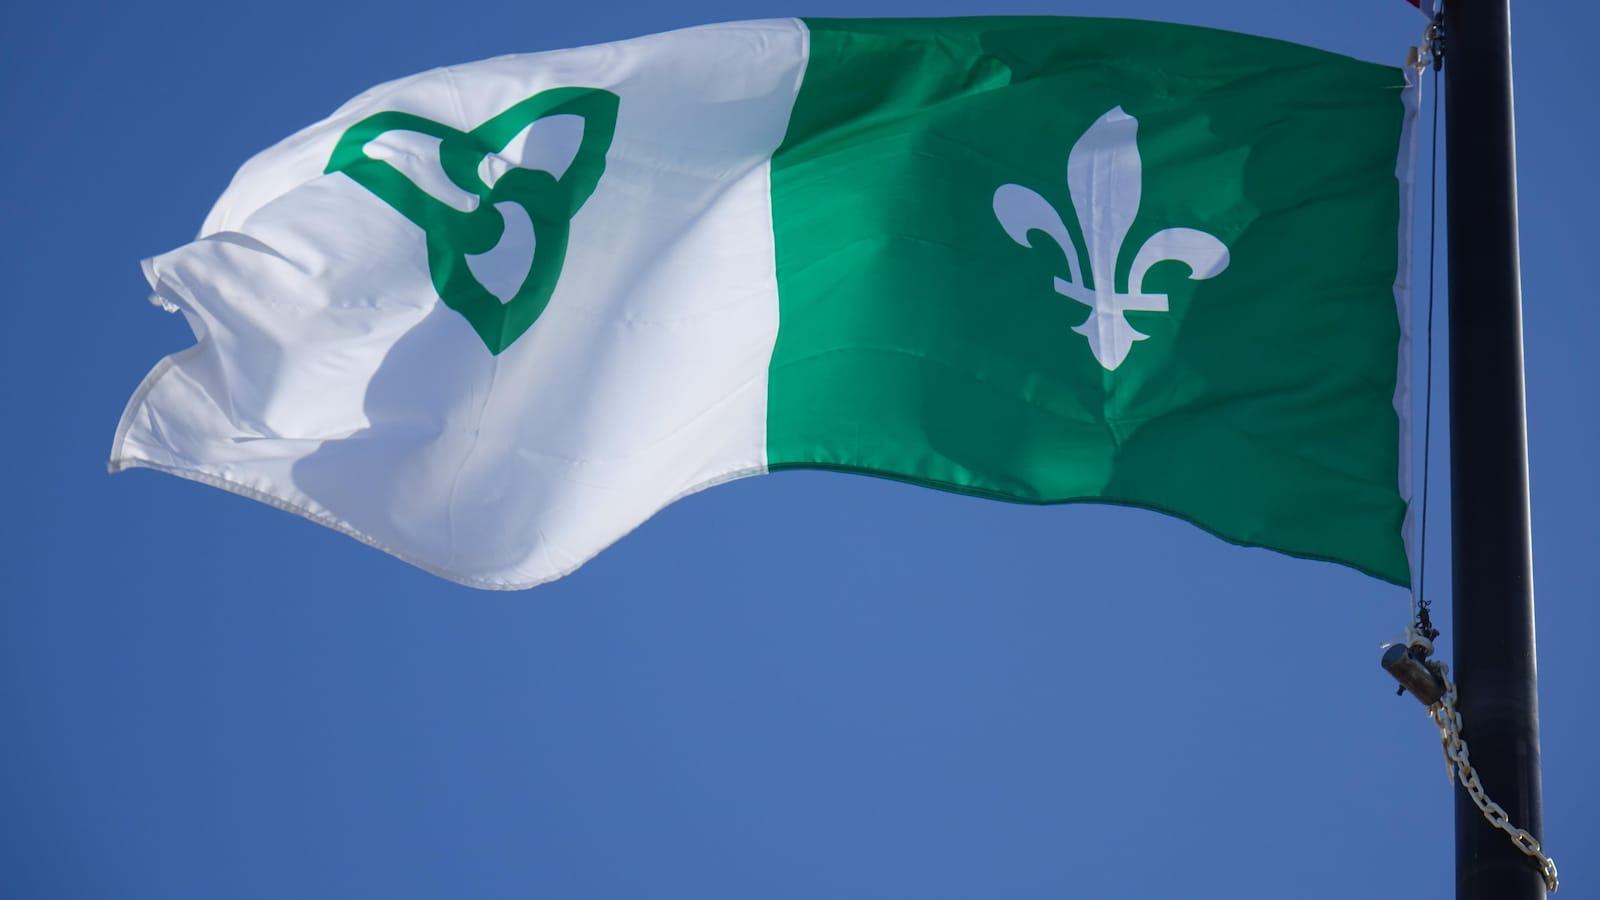 Le drapeau franco-ontarien.